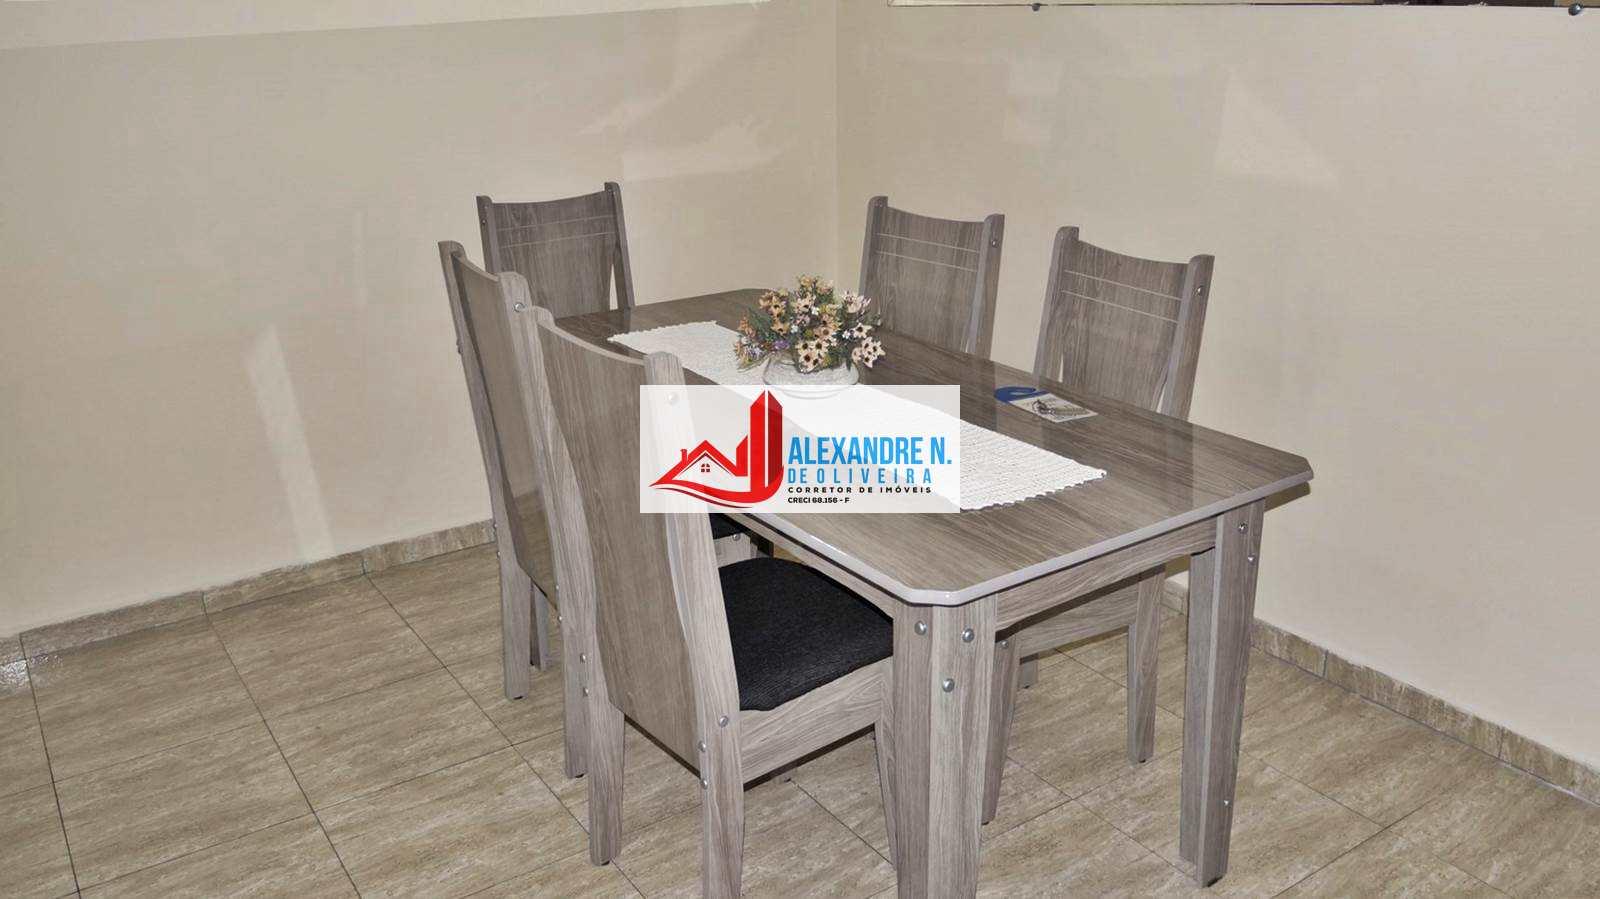 Apartamento 2 dorms, Tupi, Praia Grande - R$ 260 mil, AP00338